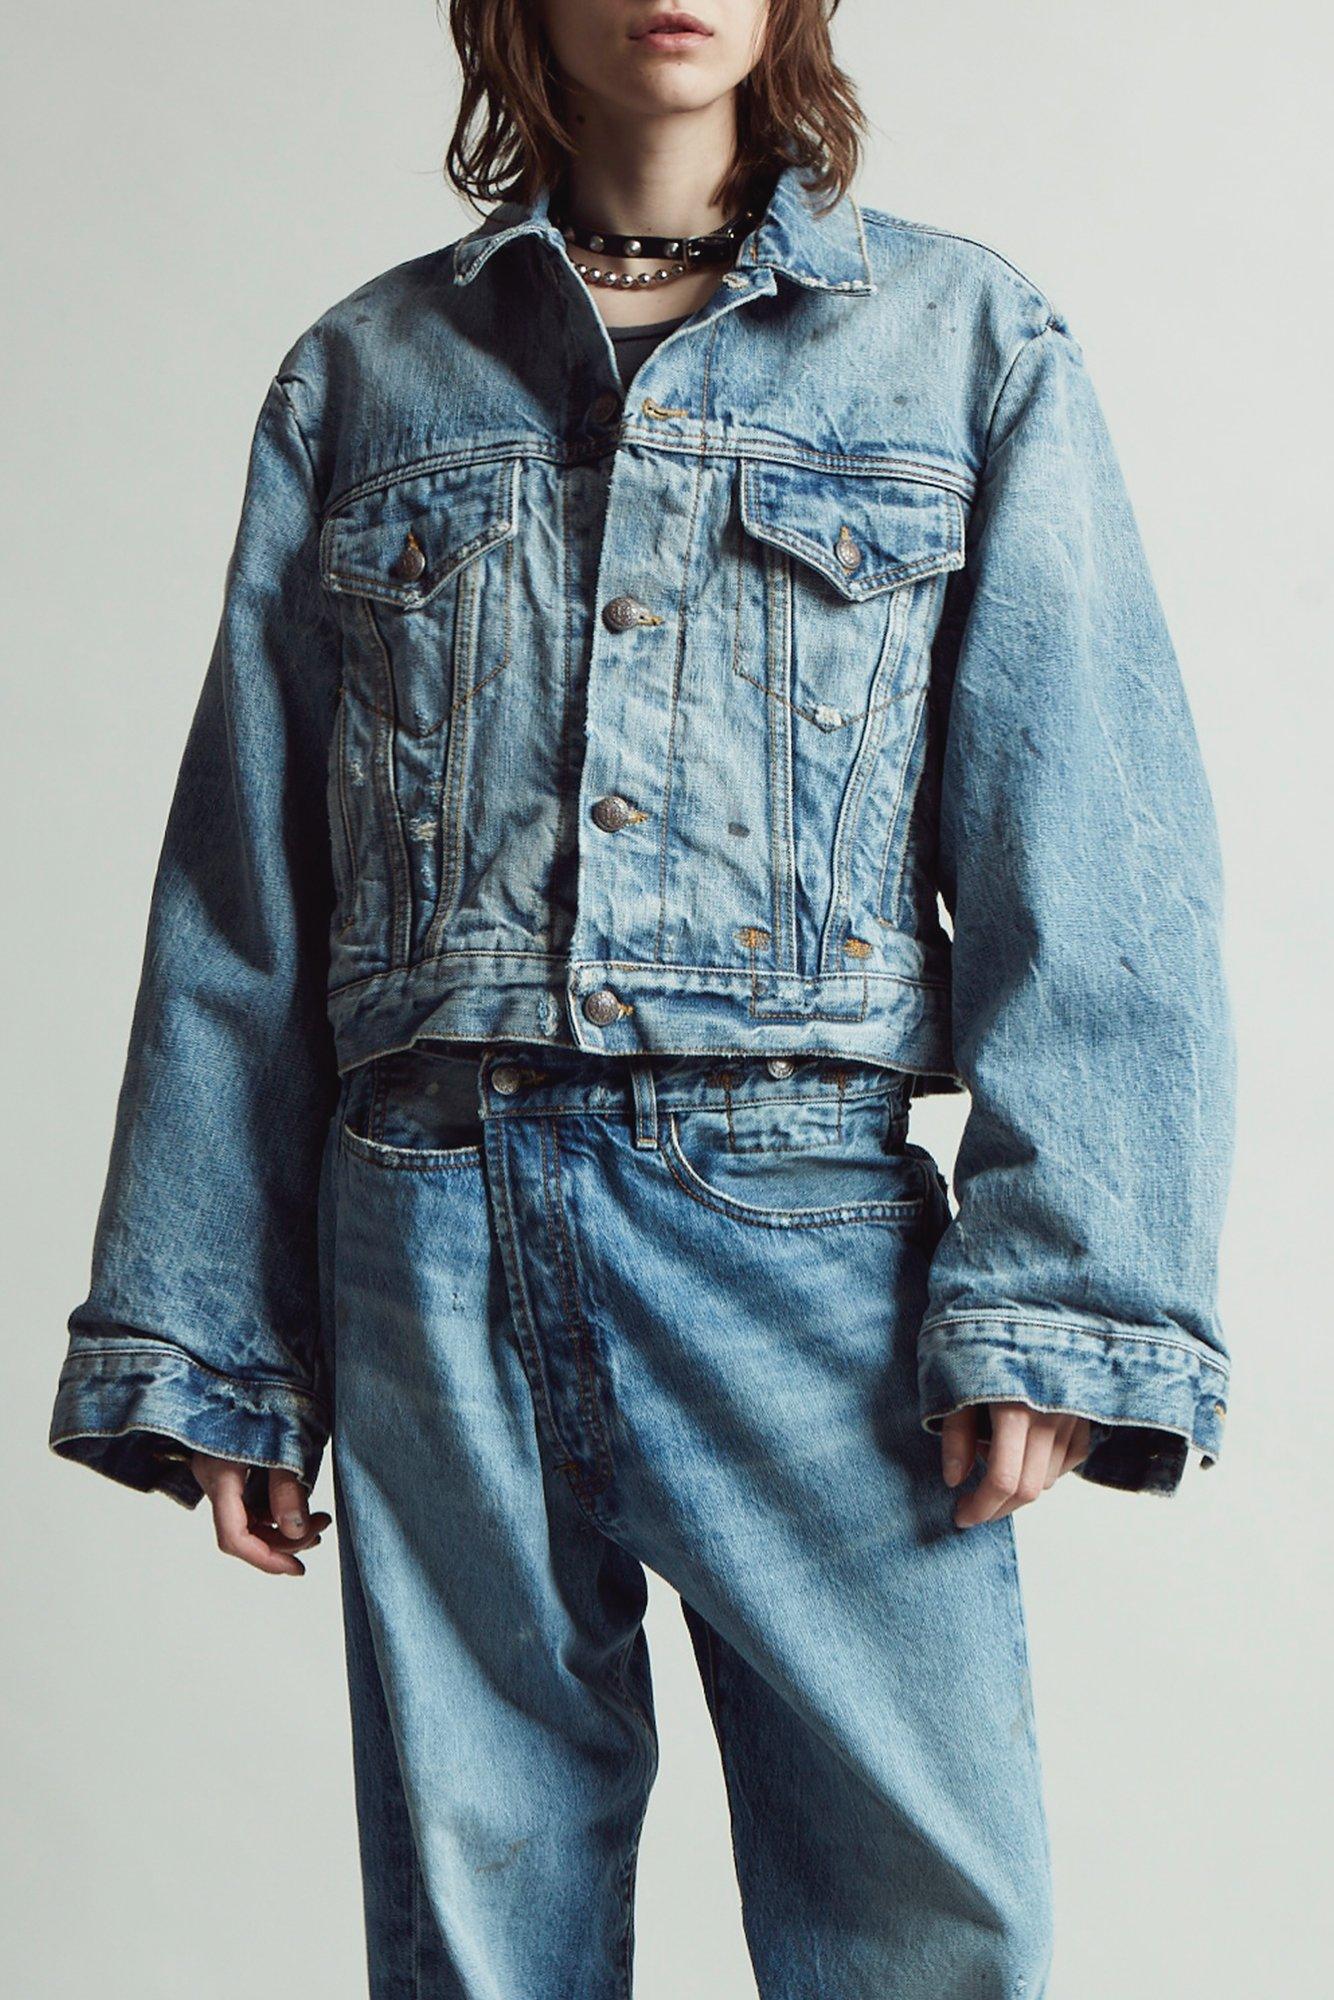 crossover jeans, wrap jeans, denim, jeans denim jacket, frayed jeans, raw hem